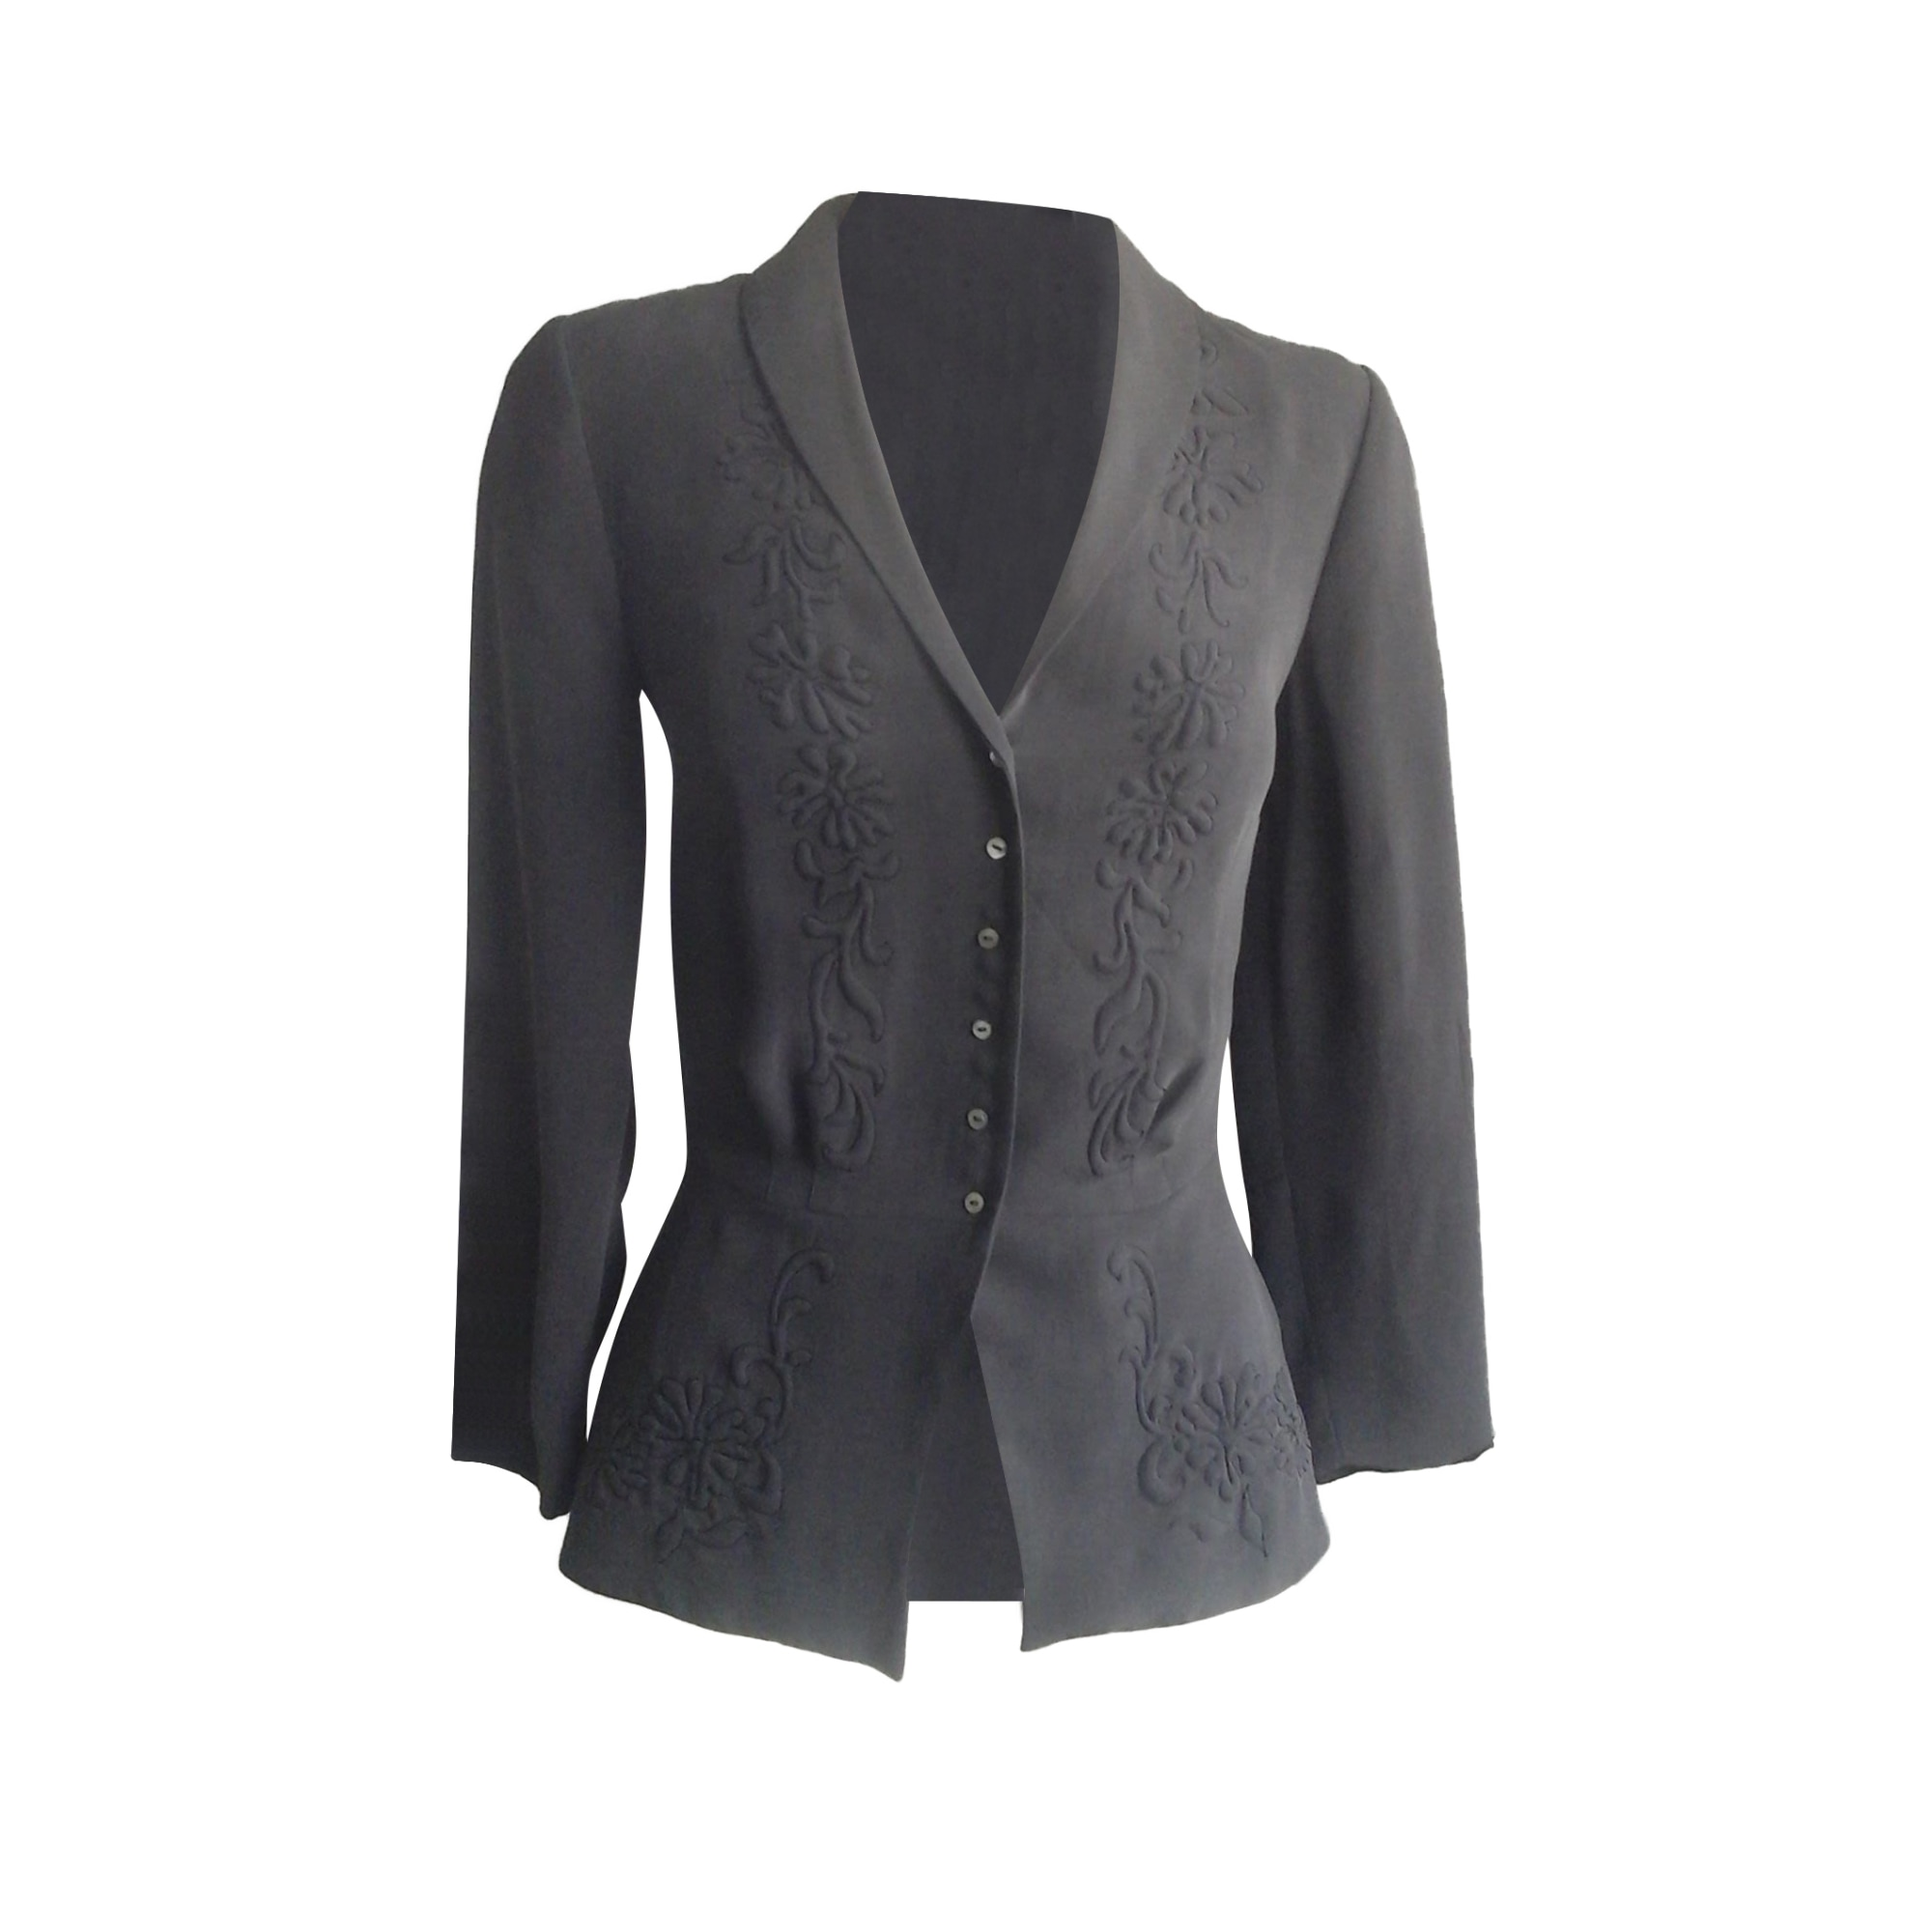 Blazer, veste tailleur ARMAND VENTILO Gris, anthracite